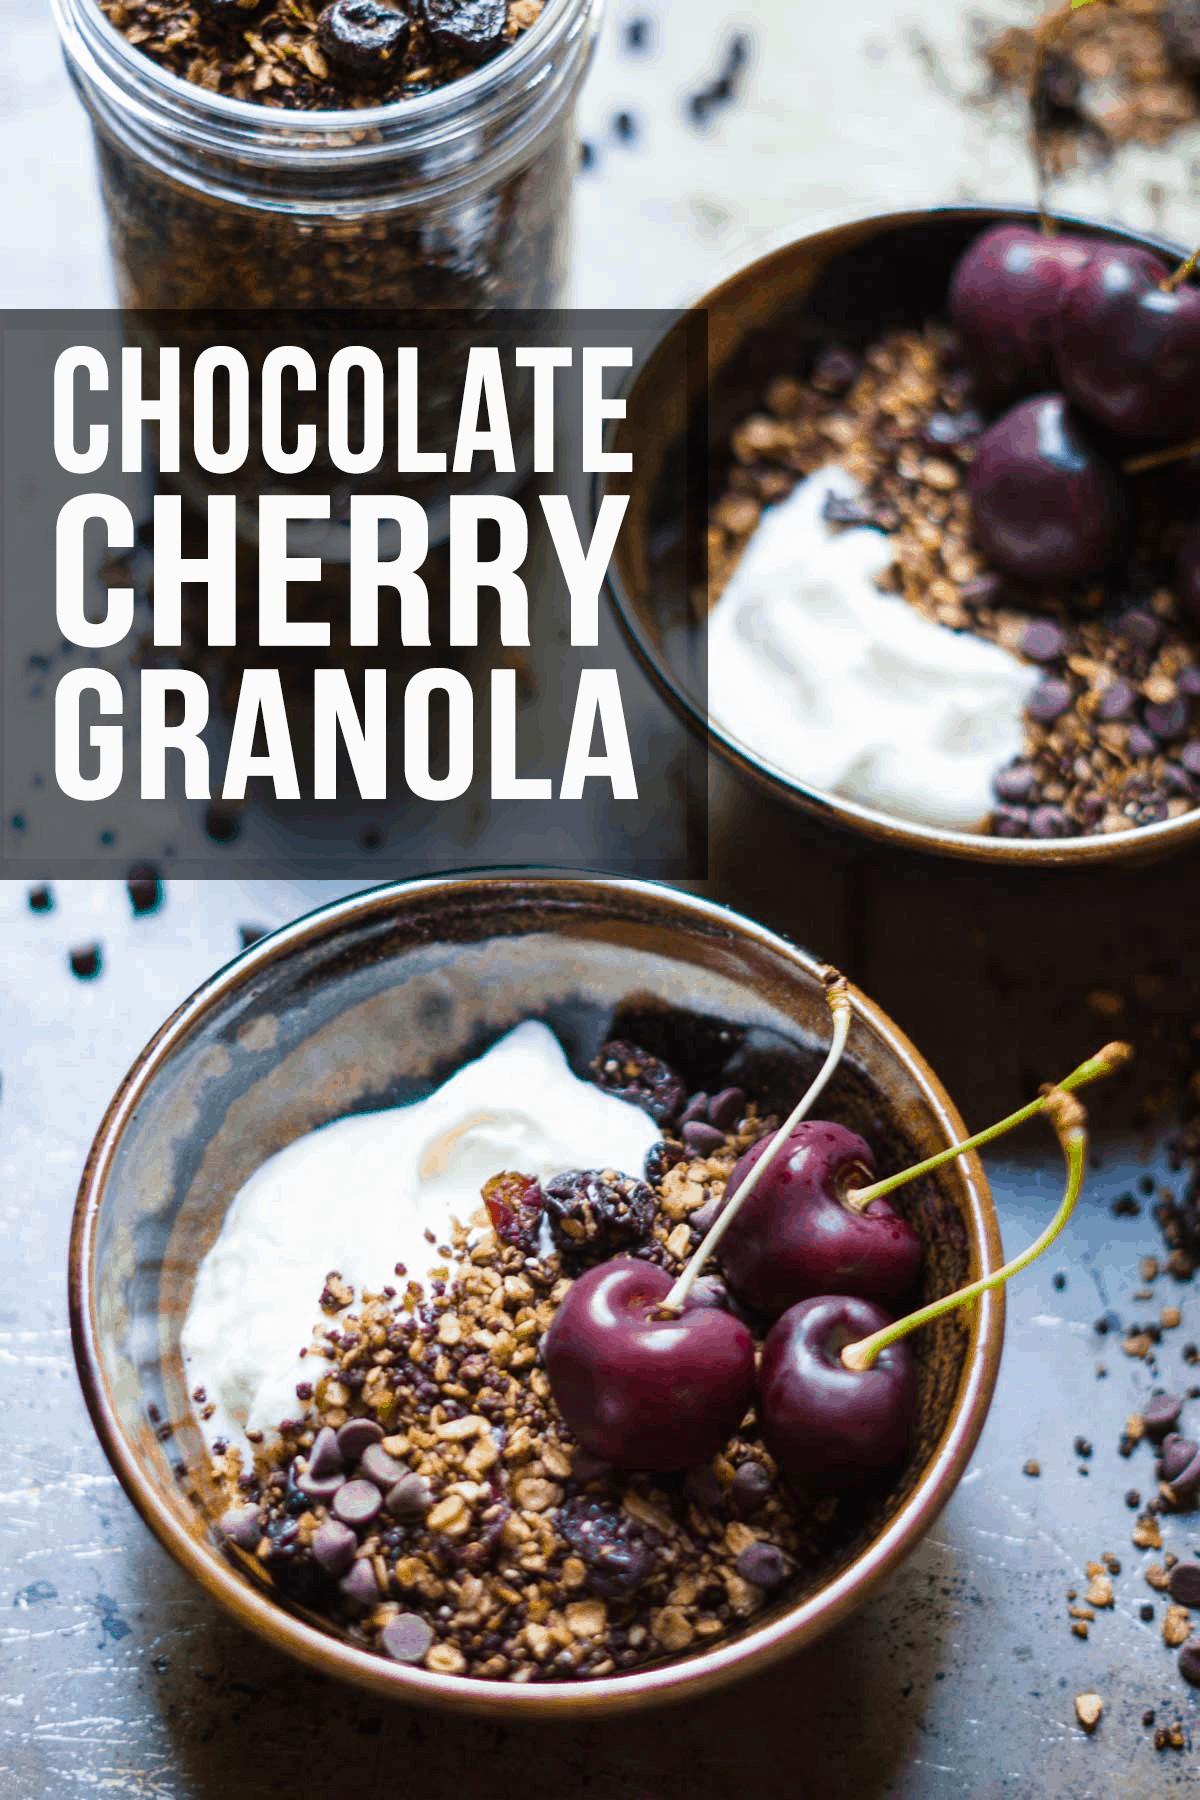 Chocolate Granola with Cherries and Quinoa | #granola #breakfast #healthybreakfast #granolarecipe #chocolate #glutenfreebreakfast #glutenfreerecipes #antiinflammatoryrecipes